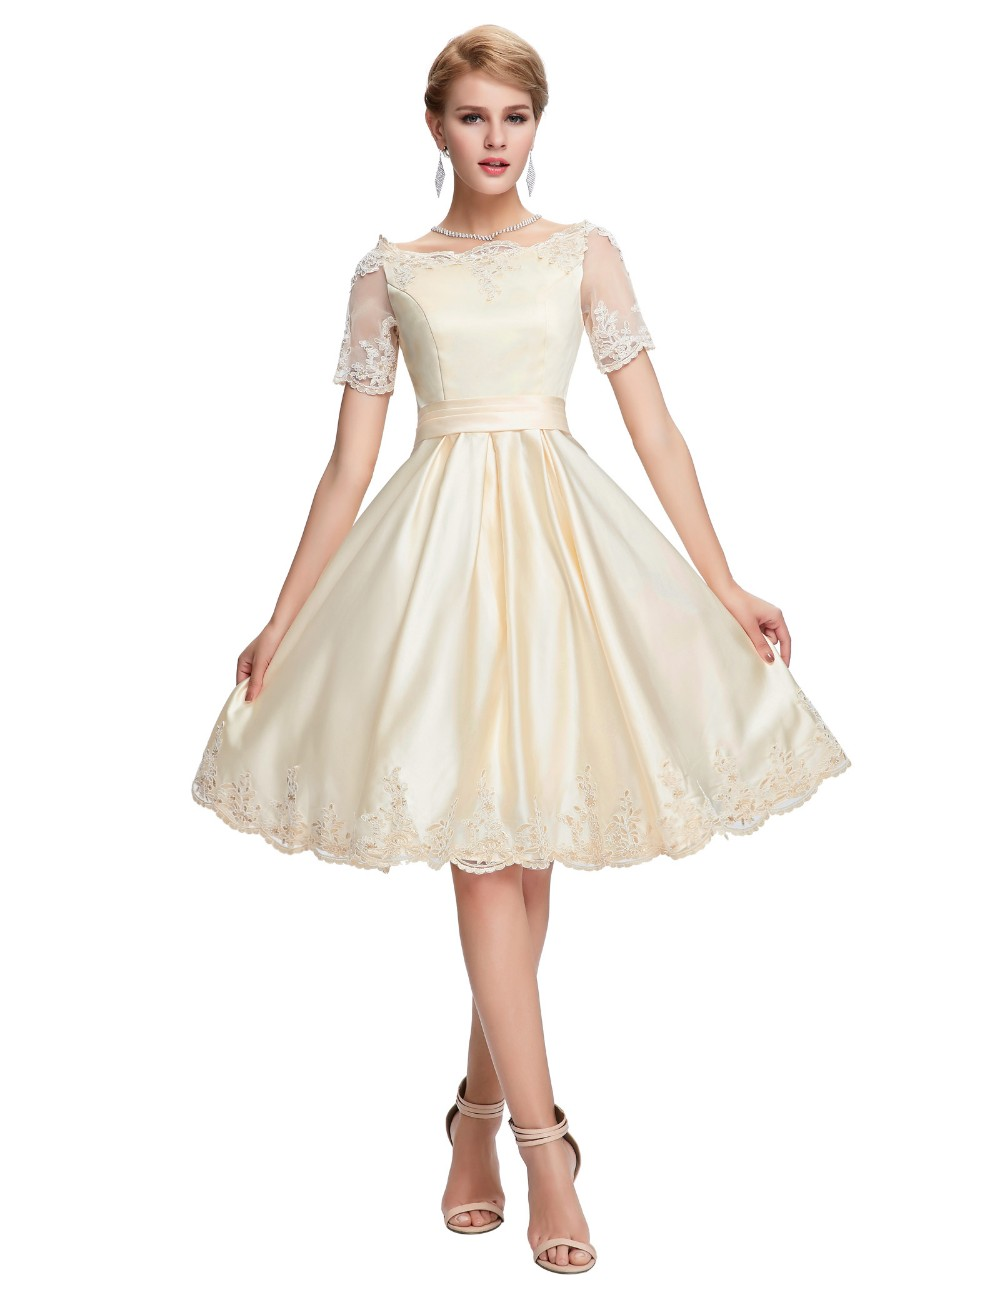 Short Cocktail Dresses 2018 Grace Karin Off The Shoulder robe de Cocktail Wedding Party Dress Satin Champagne Red Coctail Dress 10